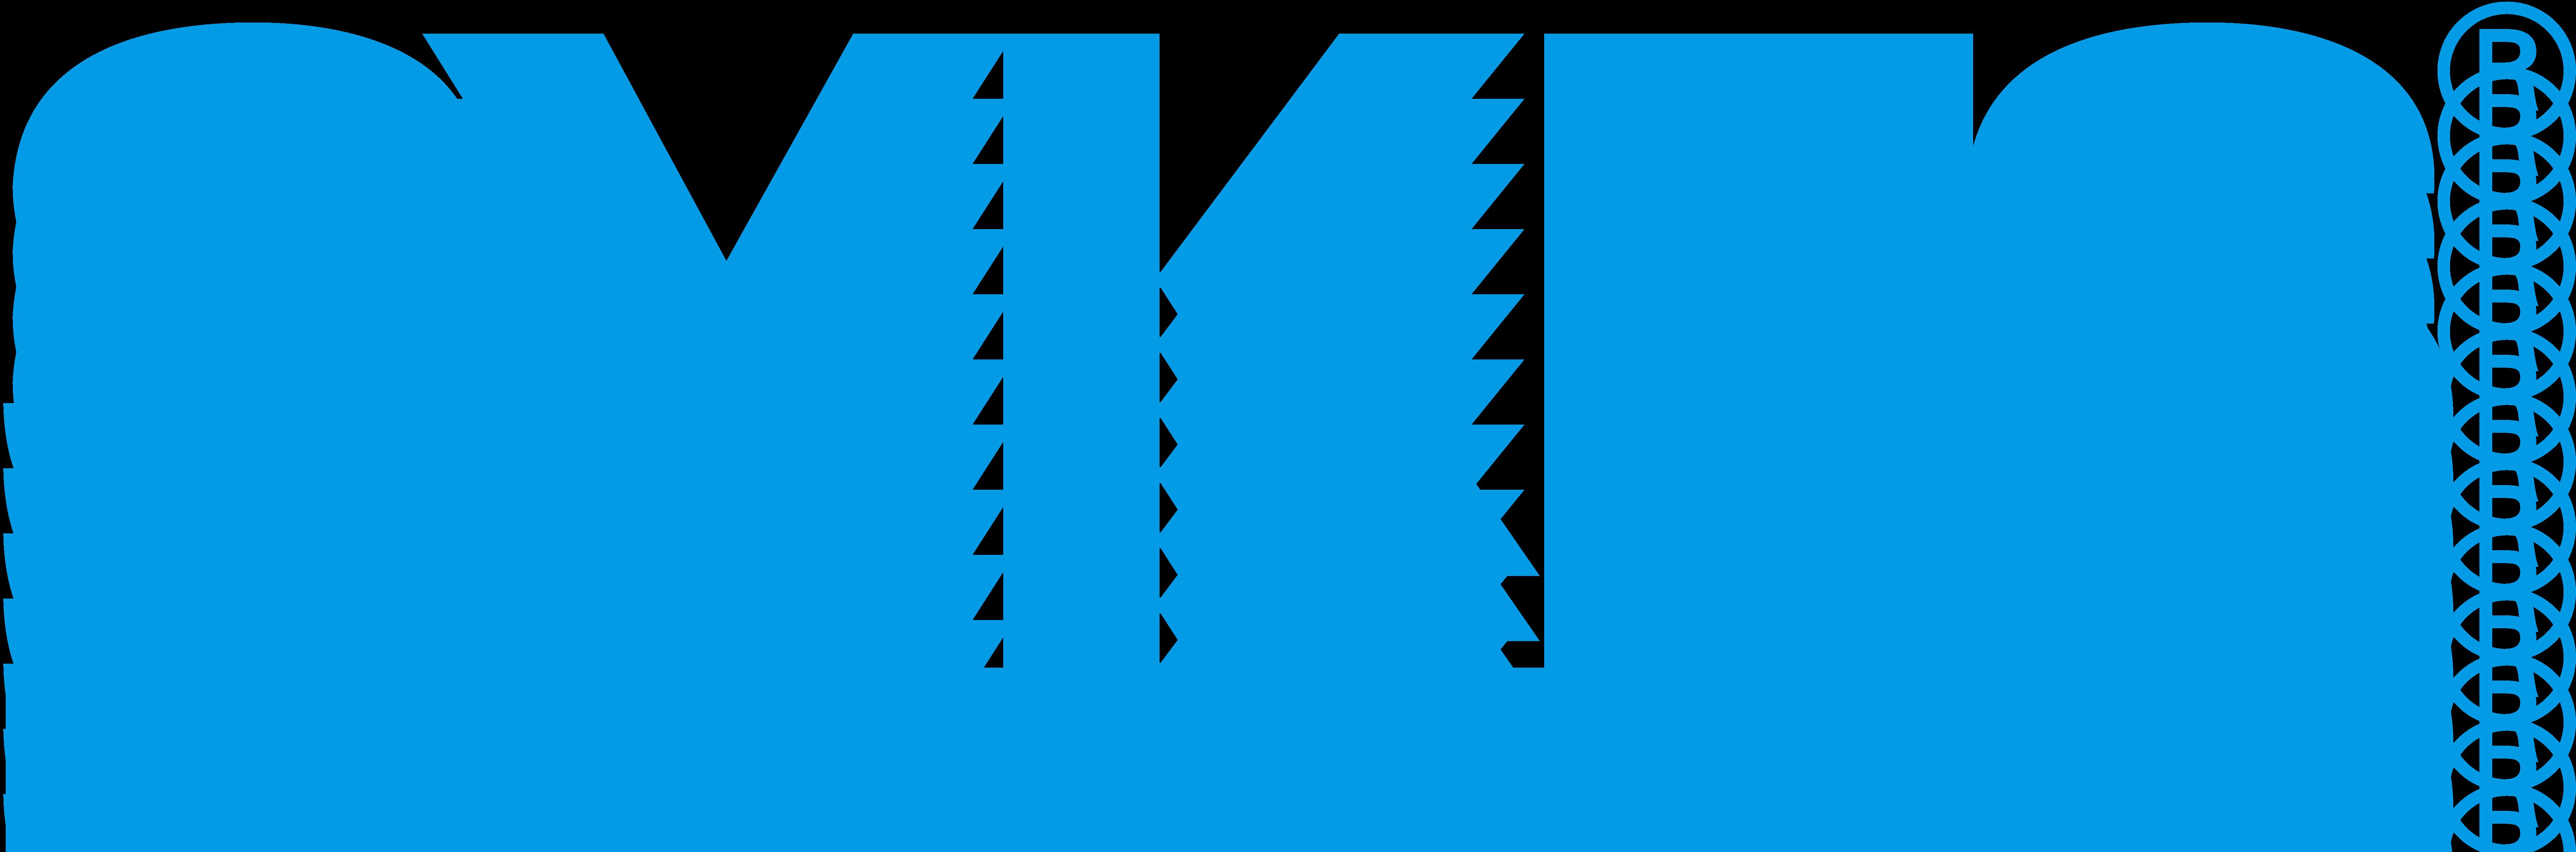 SYKES-Logo-Standard-RGB-Blue_20160920140733_9.png